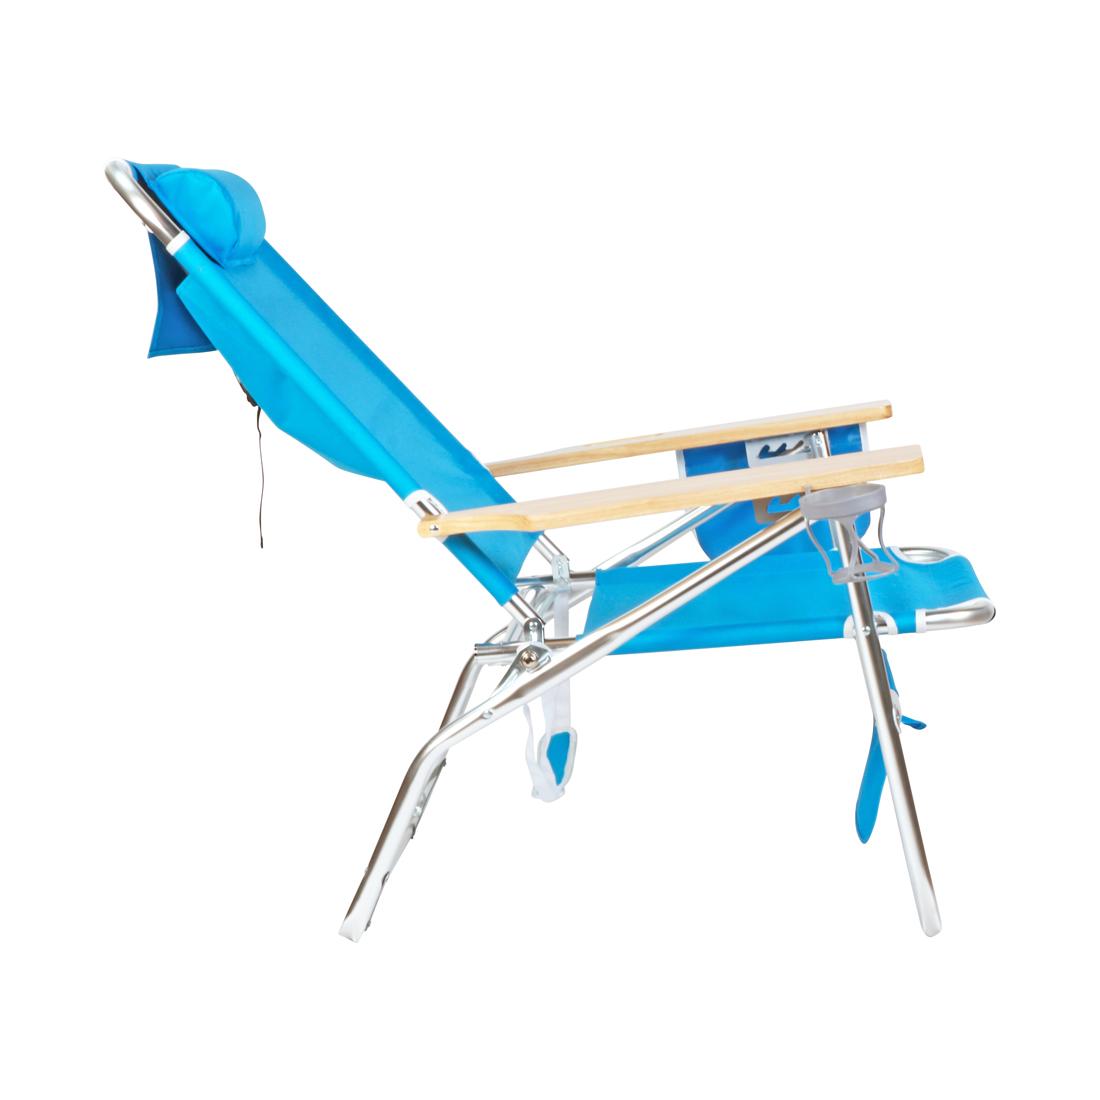 Oversized Big Jumbo Heavy Duty 500 Lbs Beach Camping Chair